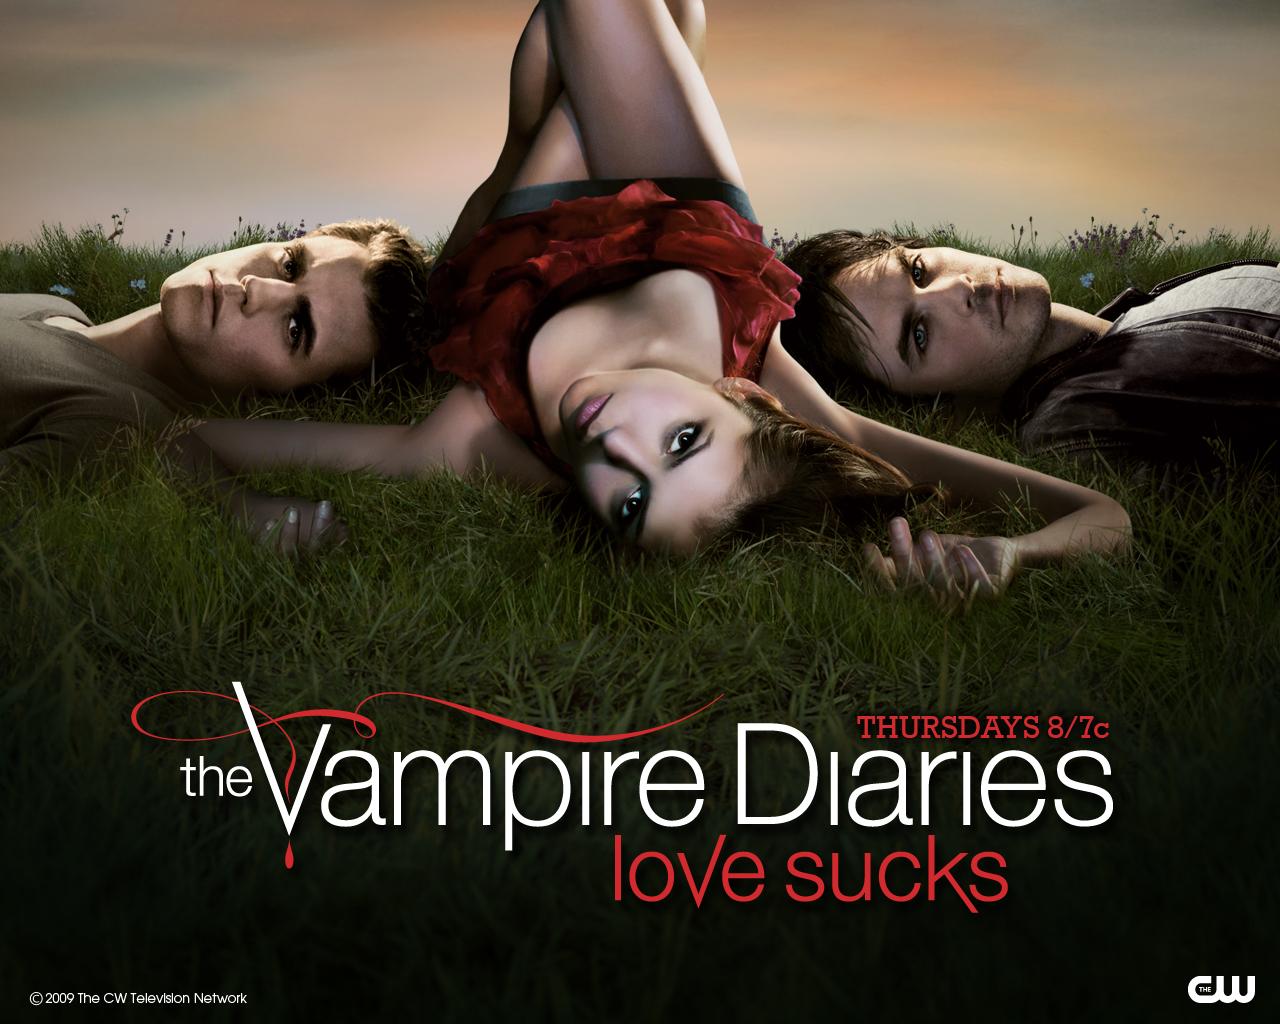 http://1.bp.blogspot.com/-yhgYYUIgwZs/UChosENO1QI/AAAAAAAACok/QwVcGcuTtzo/s1600/3378-tv_movies_the_vampire_diaries_wallpaper.jpg